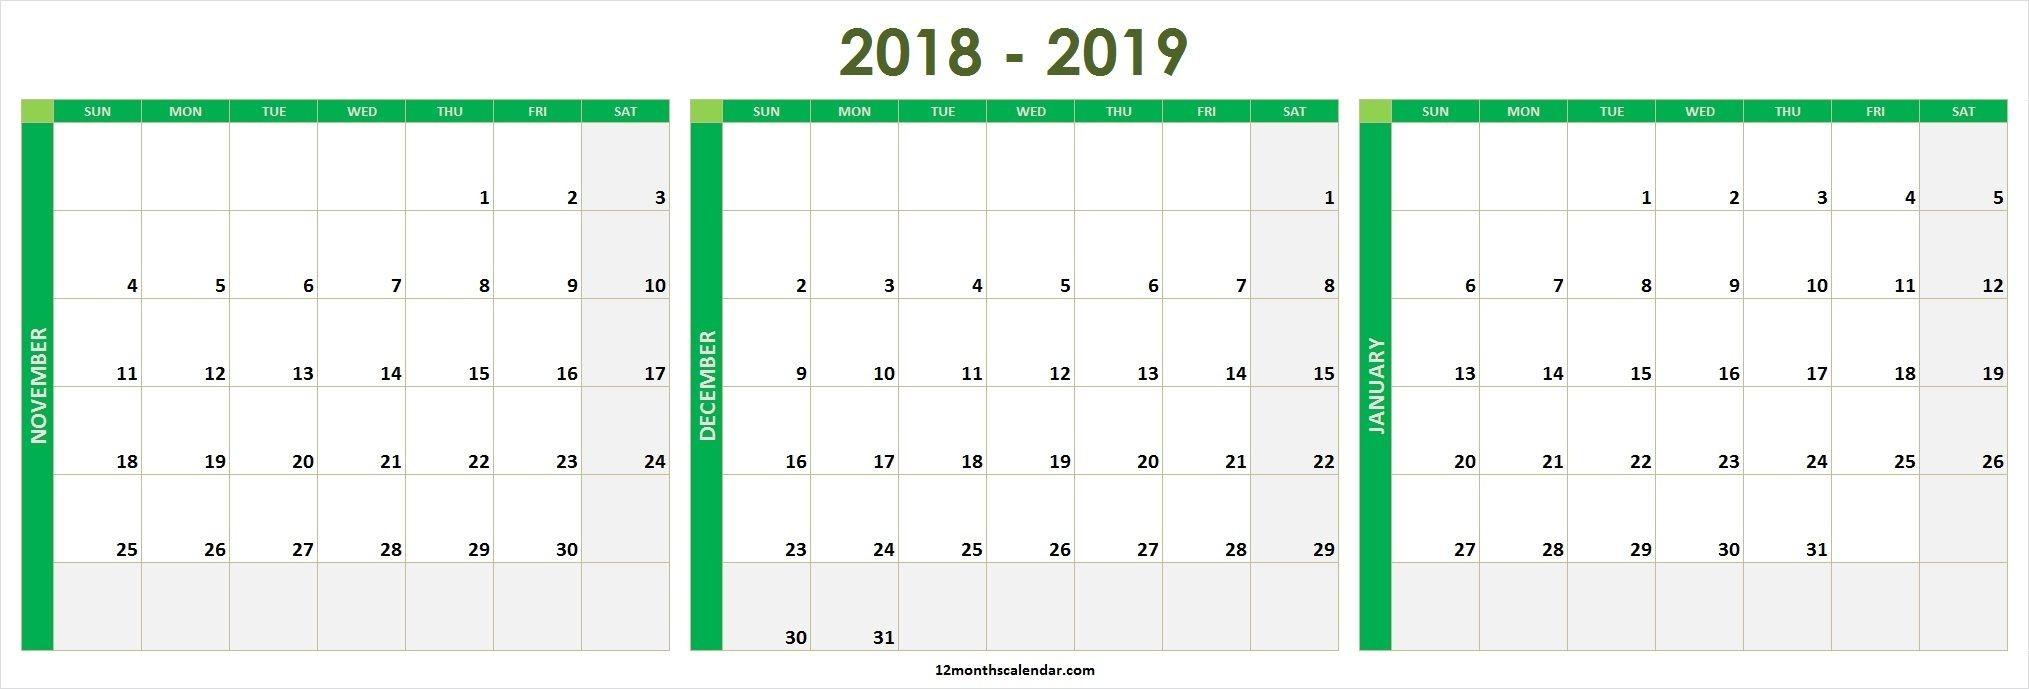 November December 2020 January 2021 Calendar Printable Free-December 2020 And January 2021 Calendar